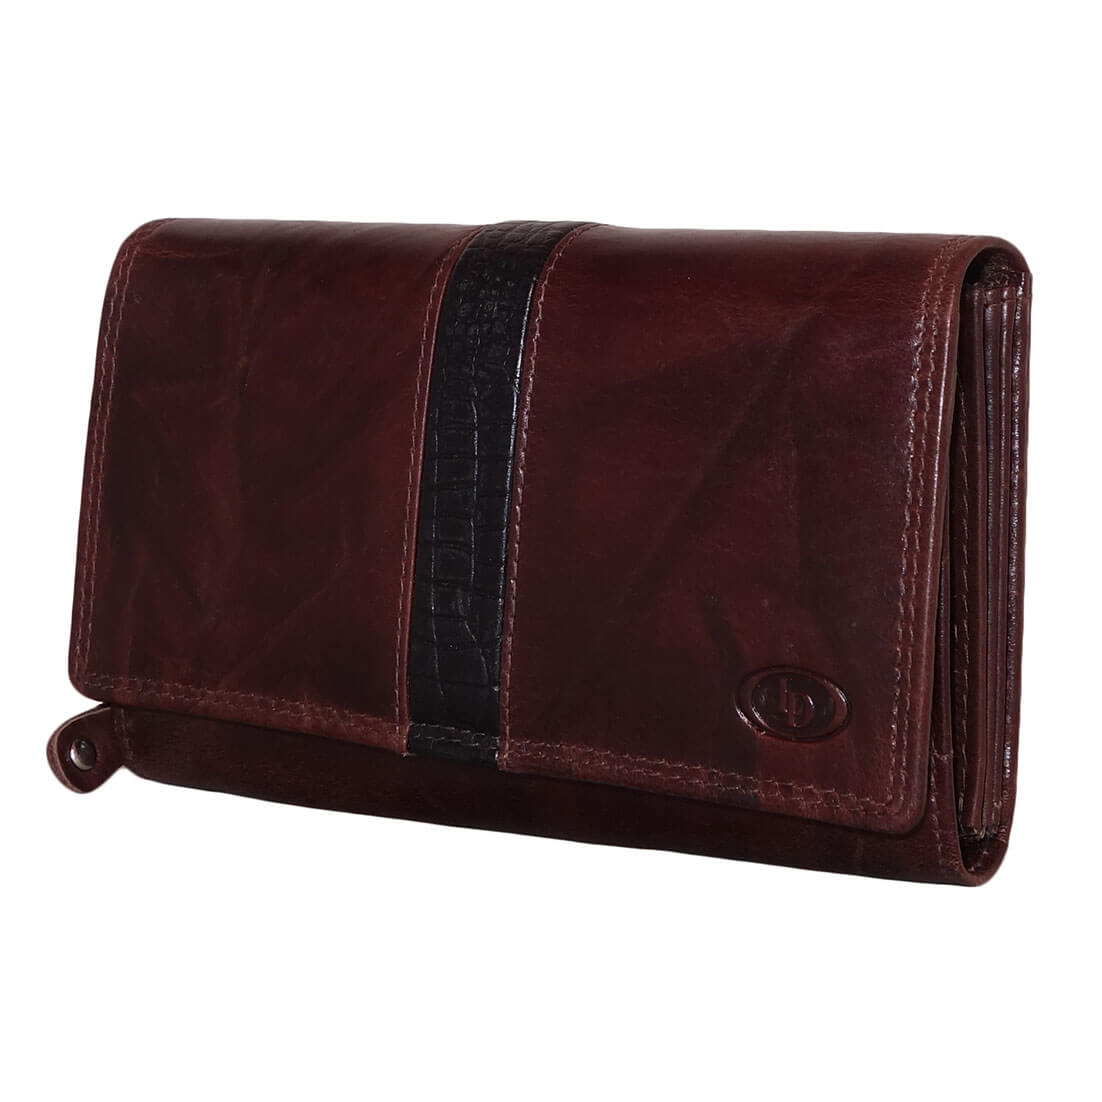 Portemonnee Leder Dames.Leather Design Dames Portemonnee Croco Bruin Online Kopen